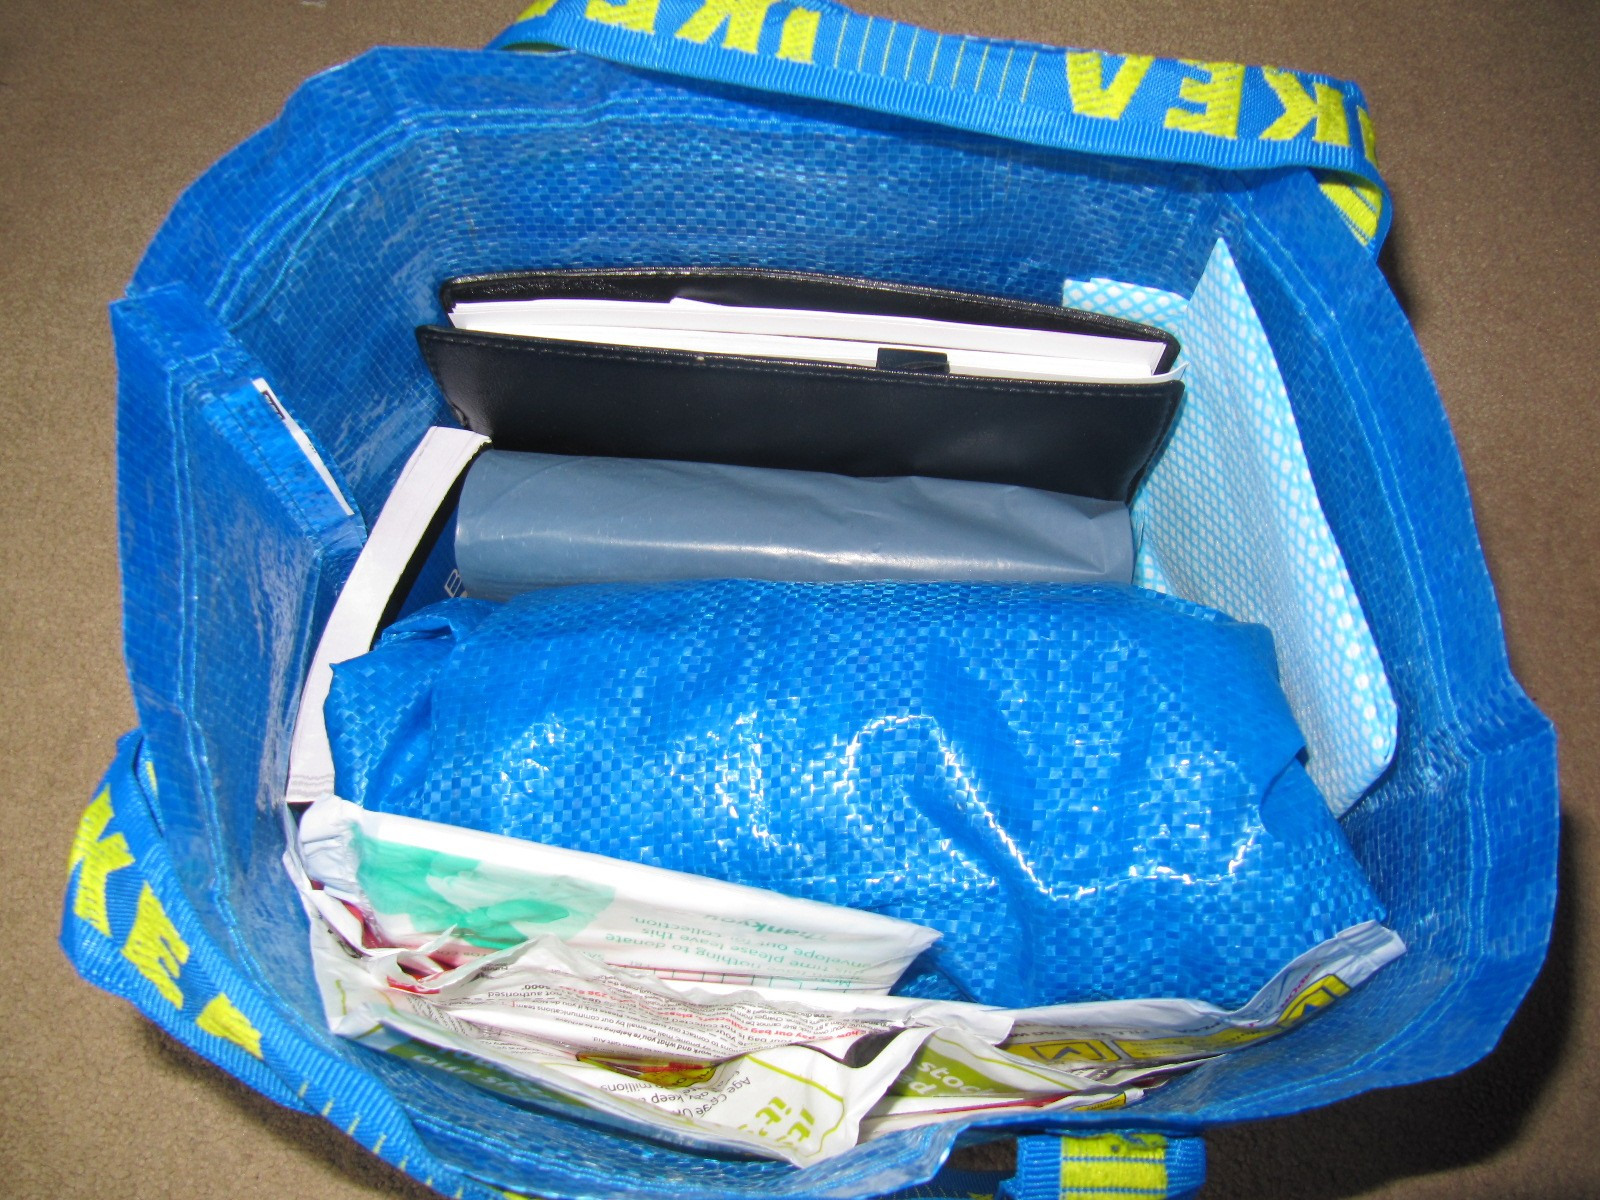 Ikea Baby Blue DeclutteringBag